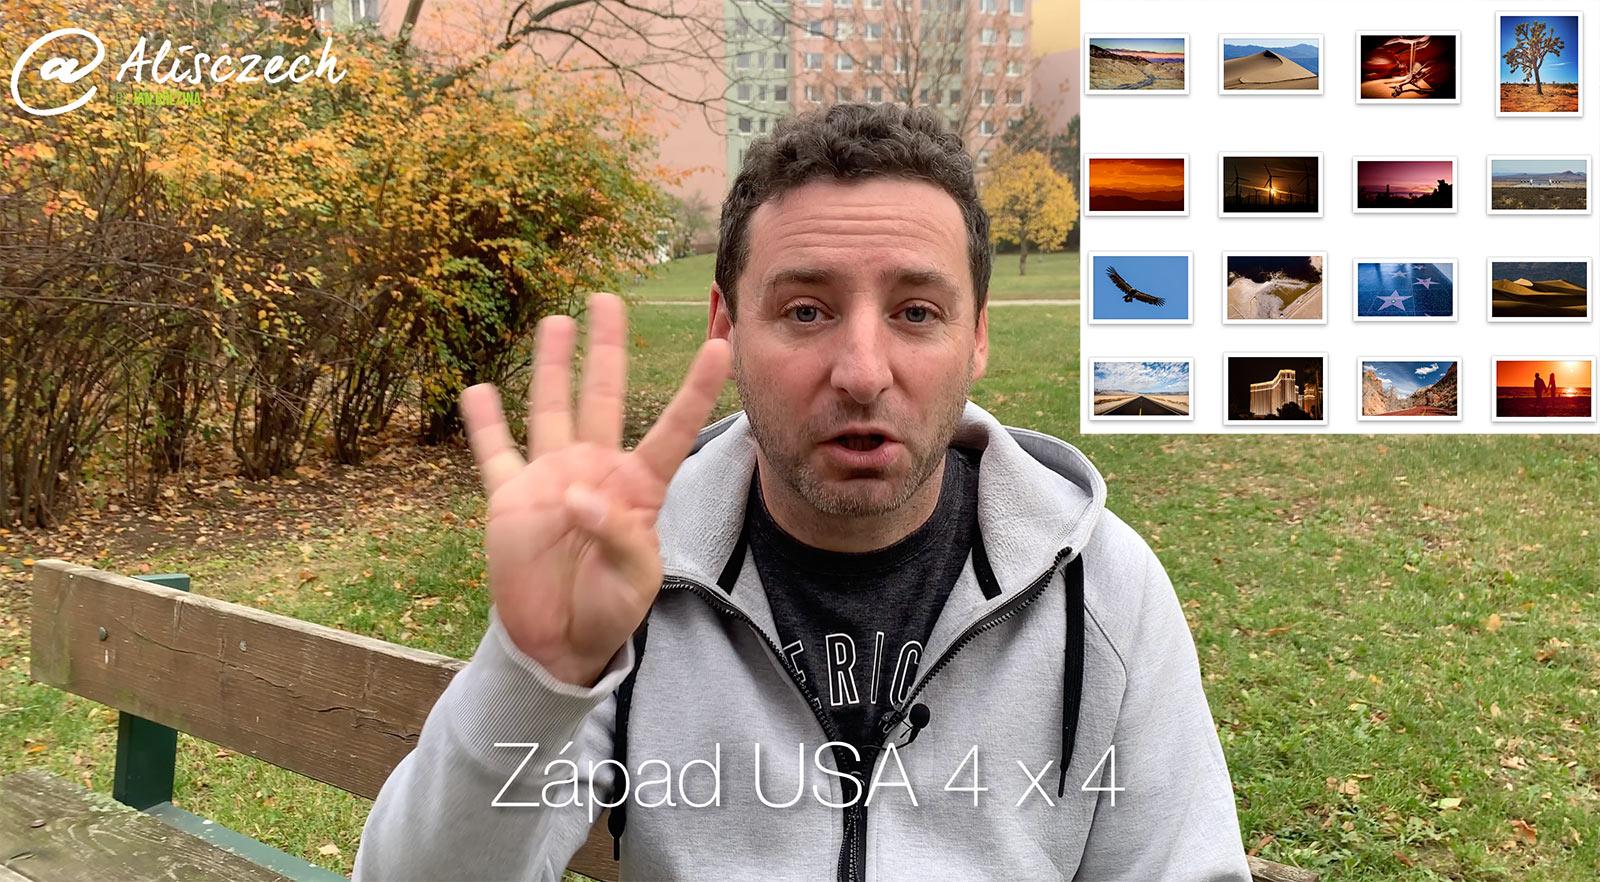 Fotoexpedice západ USA 4x4